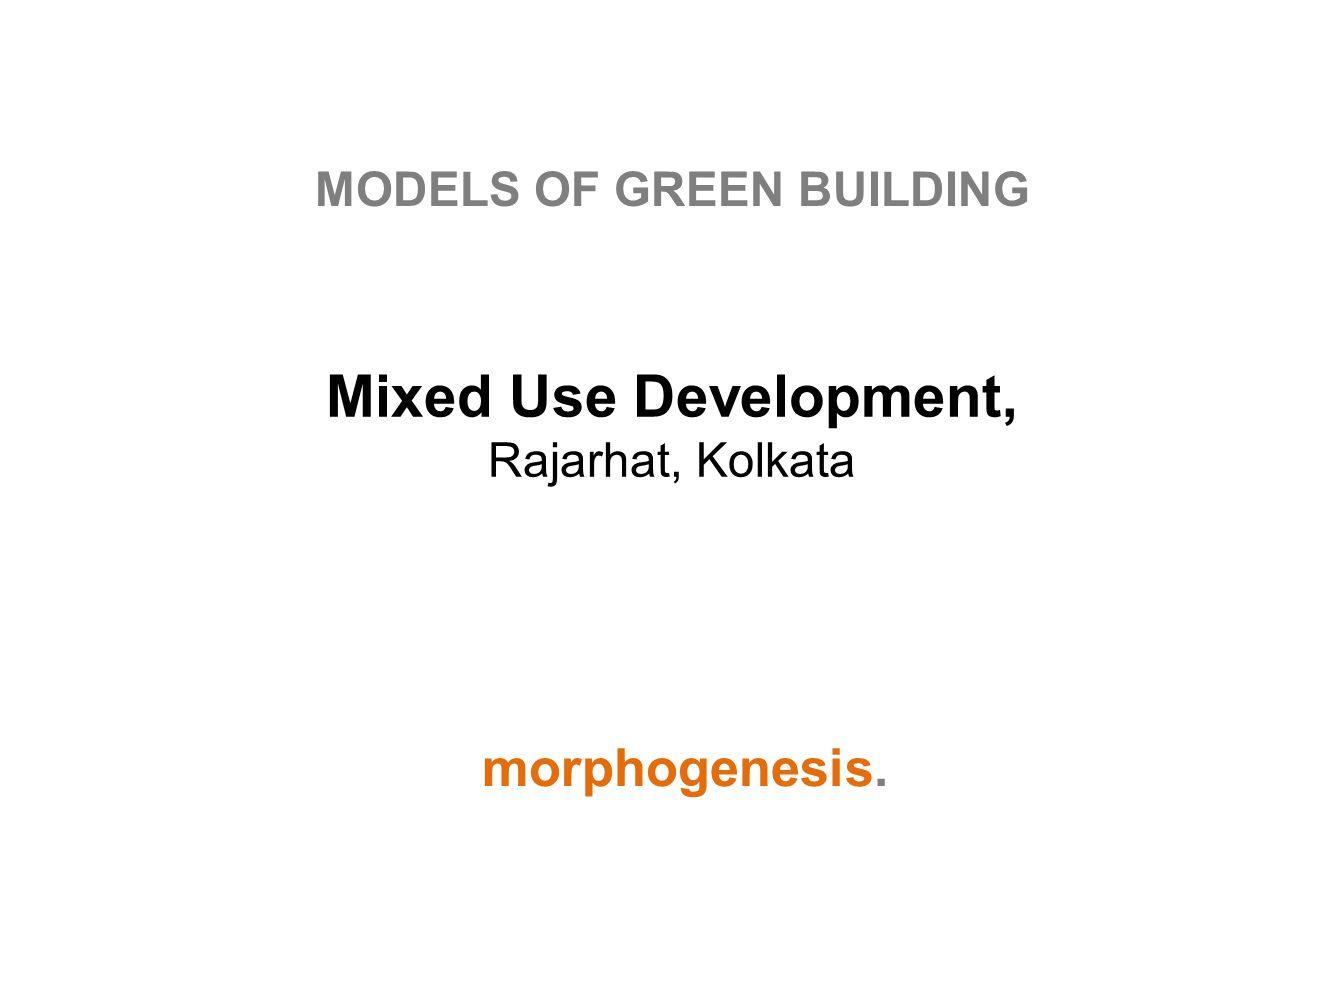 morphogenesis. MODELS OF GREEN BUILDING Mixed Use Development, Rajarhat, Kolkata